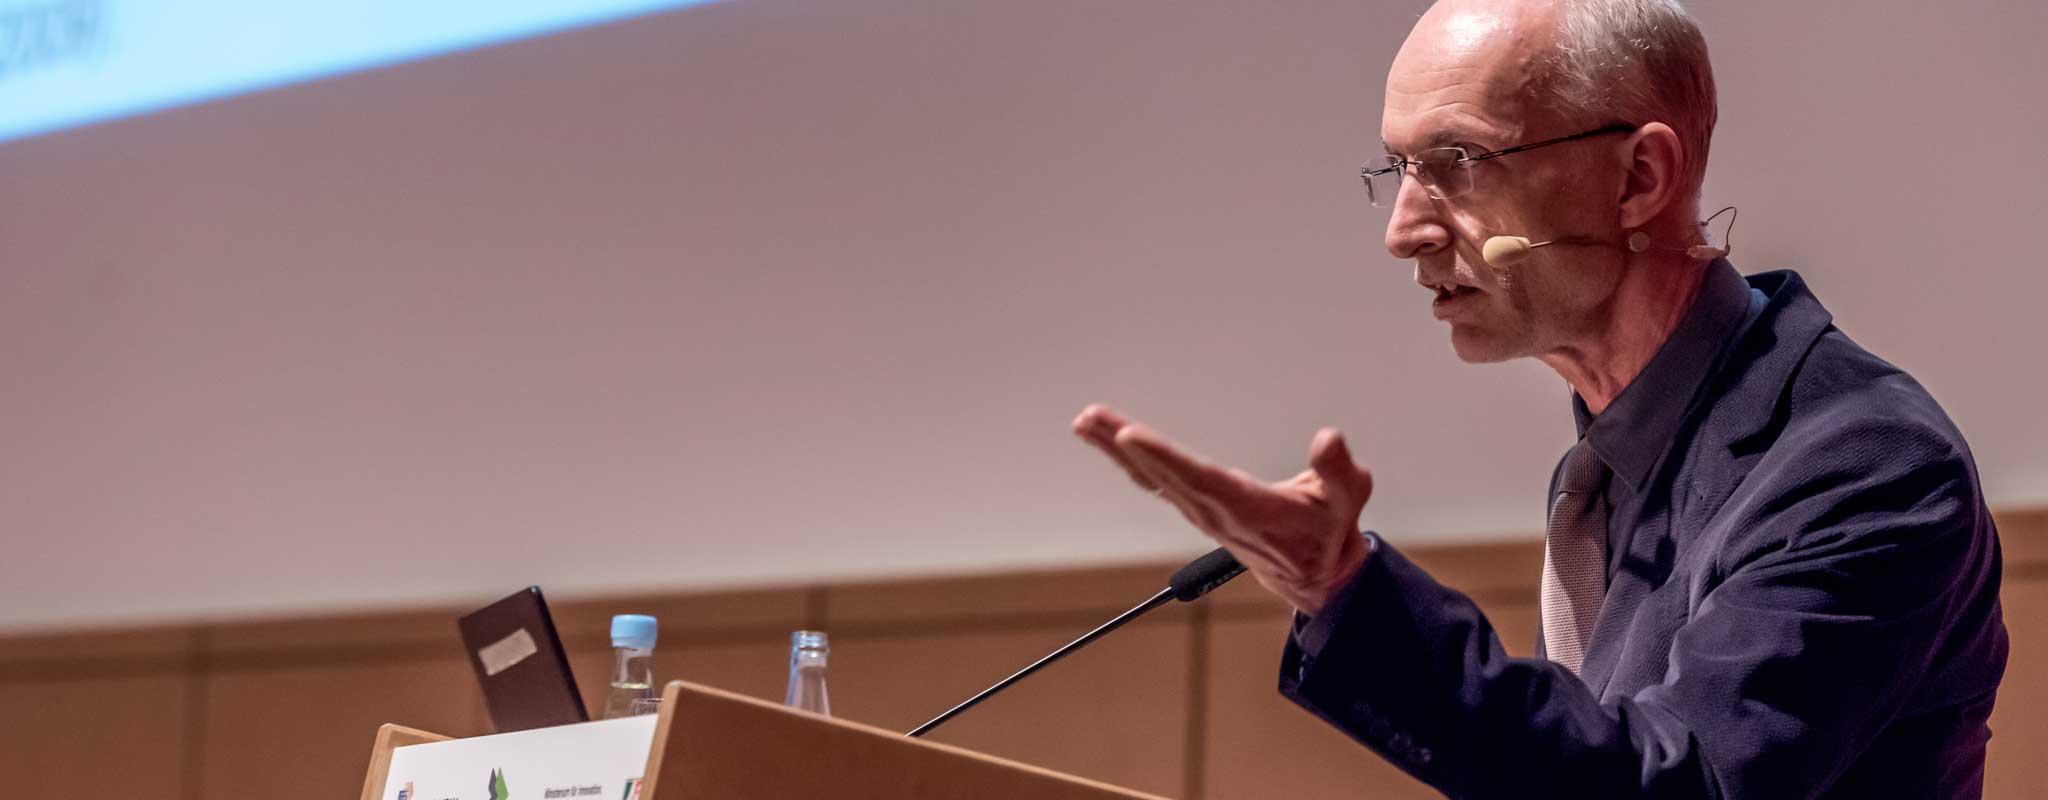 7th NRW Nano Conference Keynote-Speaker Prof. Dr. Stuart Parkin